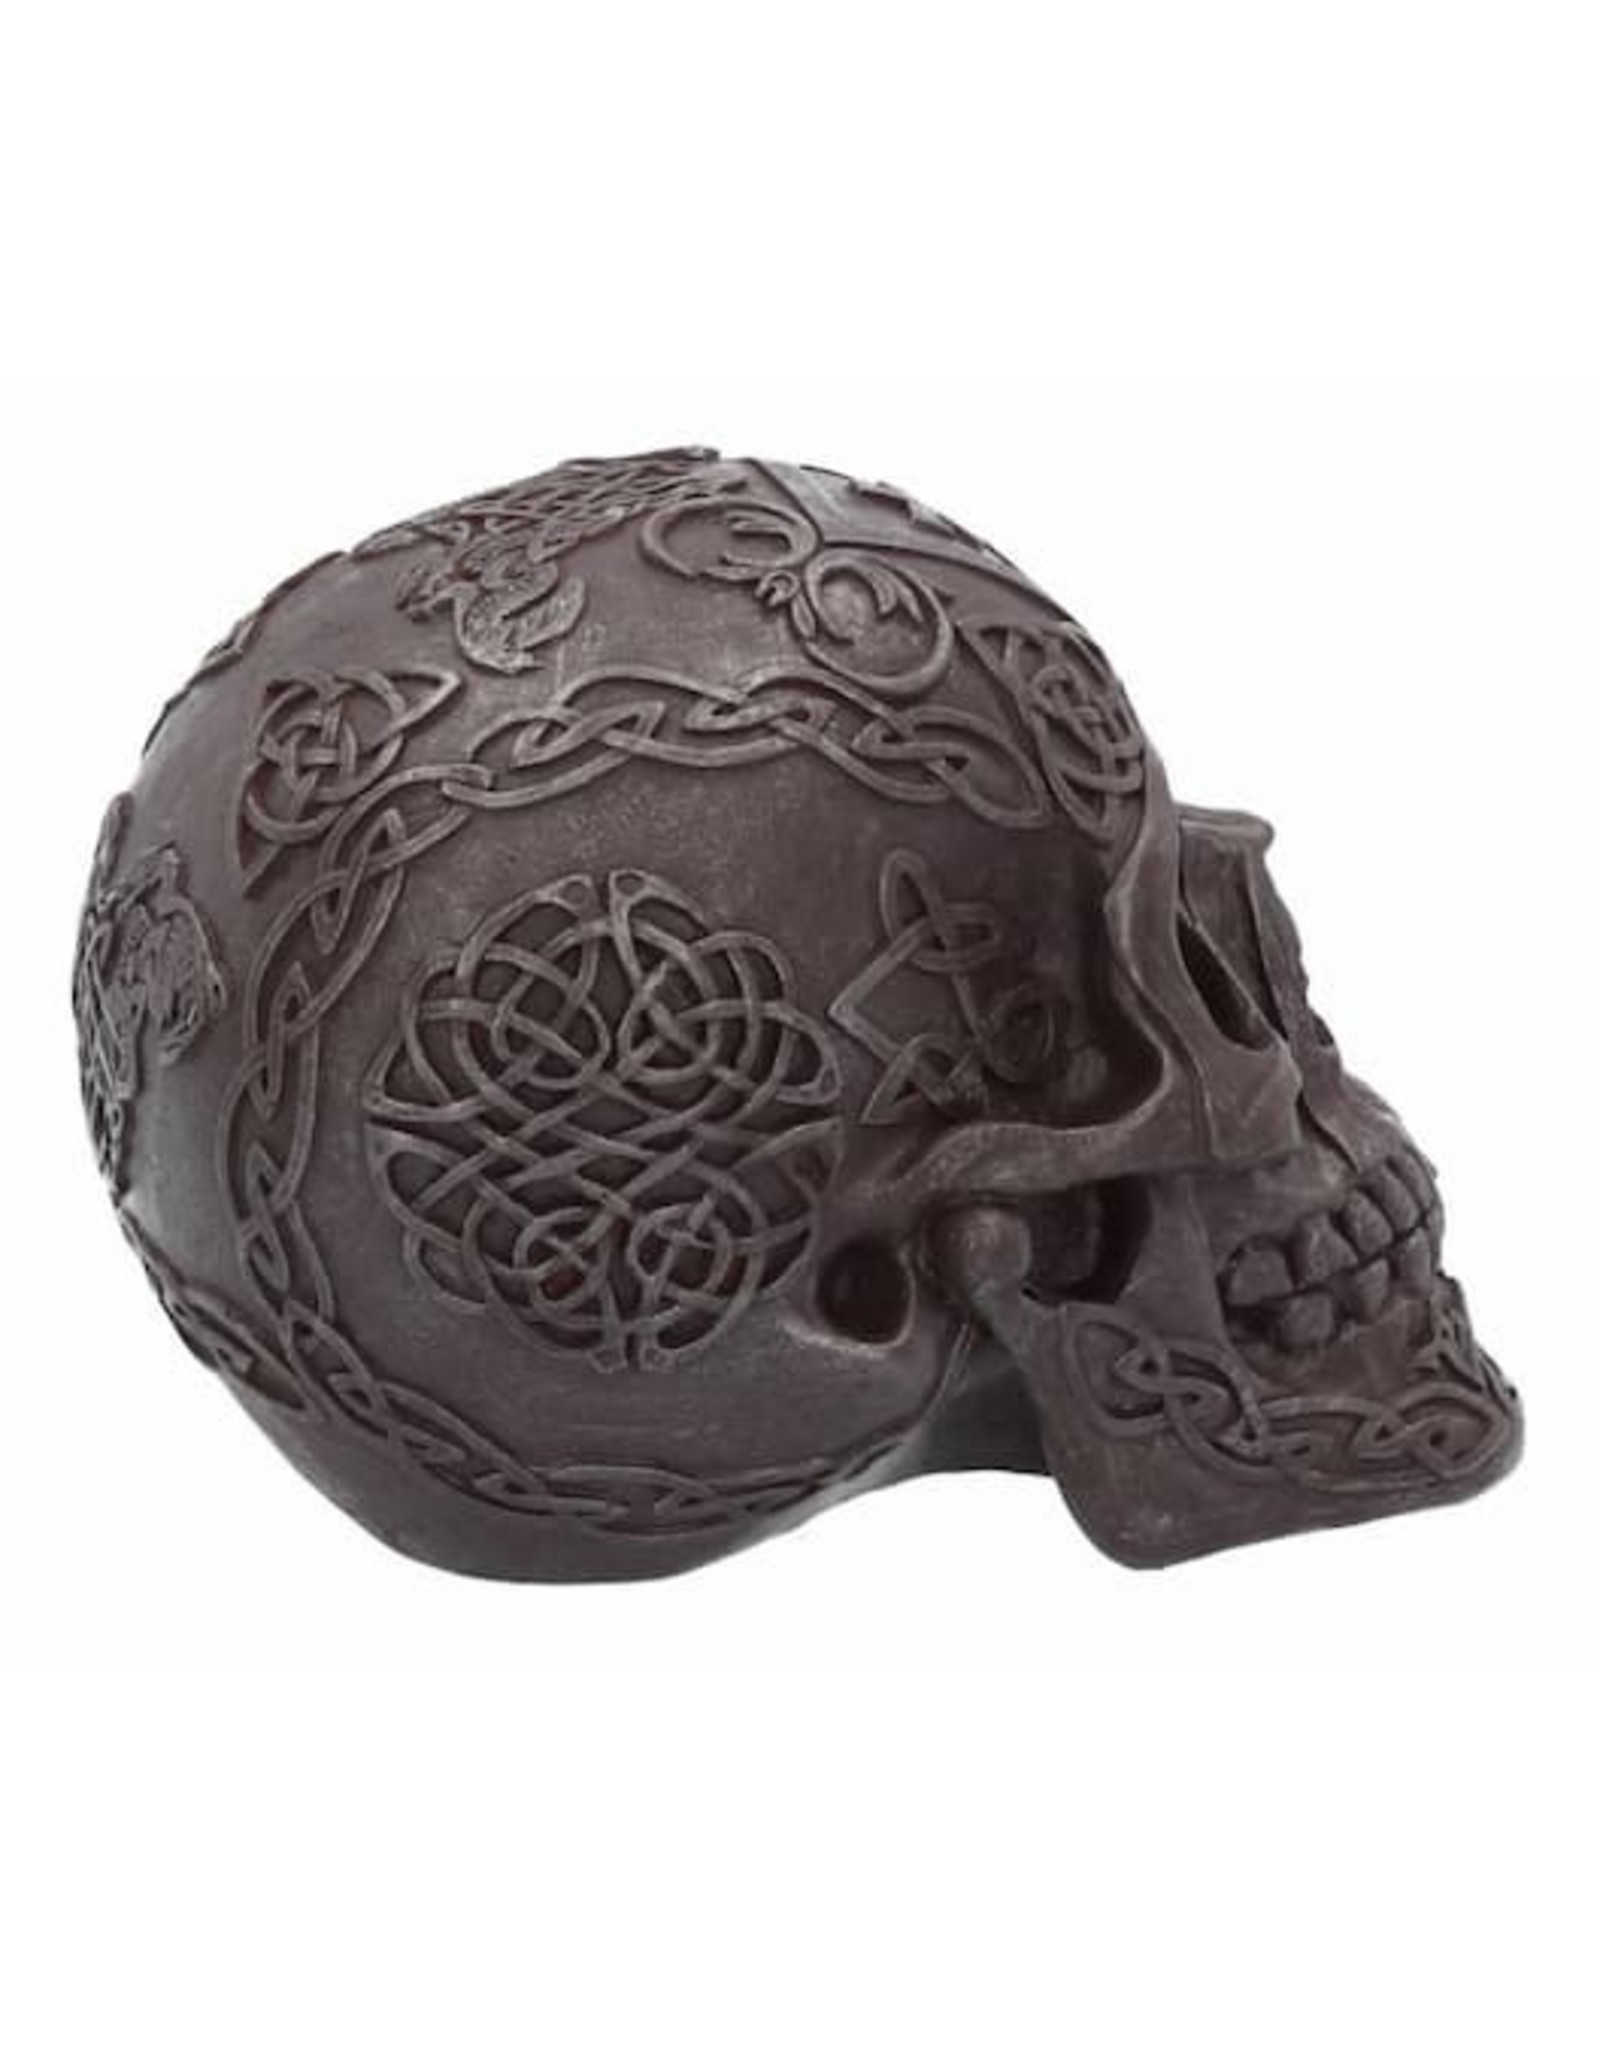 Alator Skulls - Skull Celtic Iron - Nemesis Now